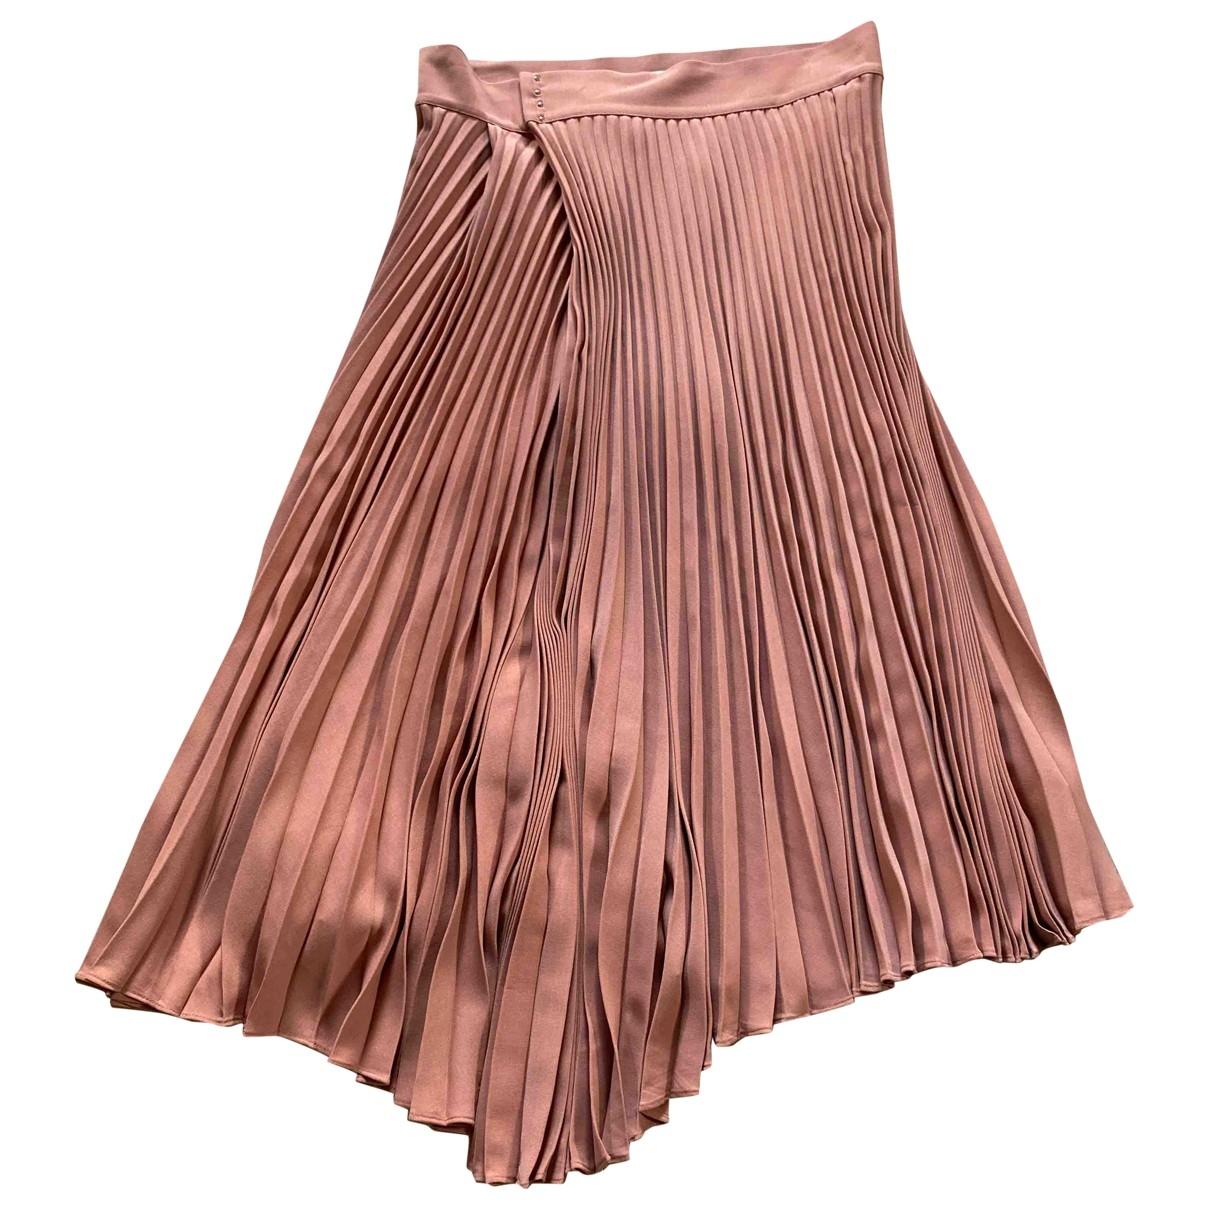 Vince \N Pink skirt for Women 8 US